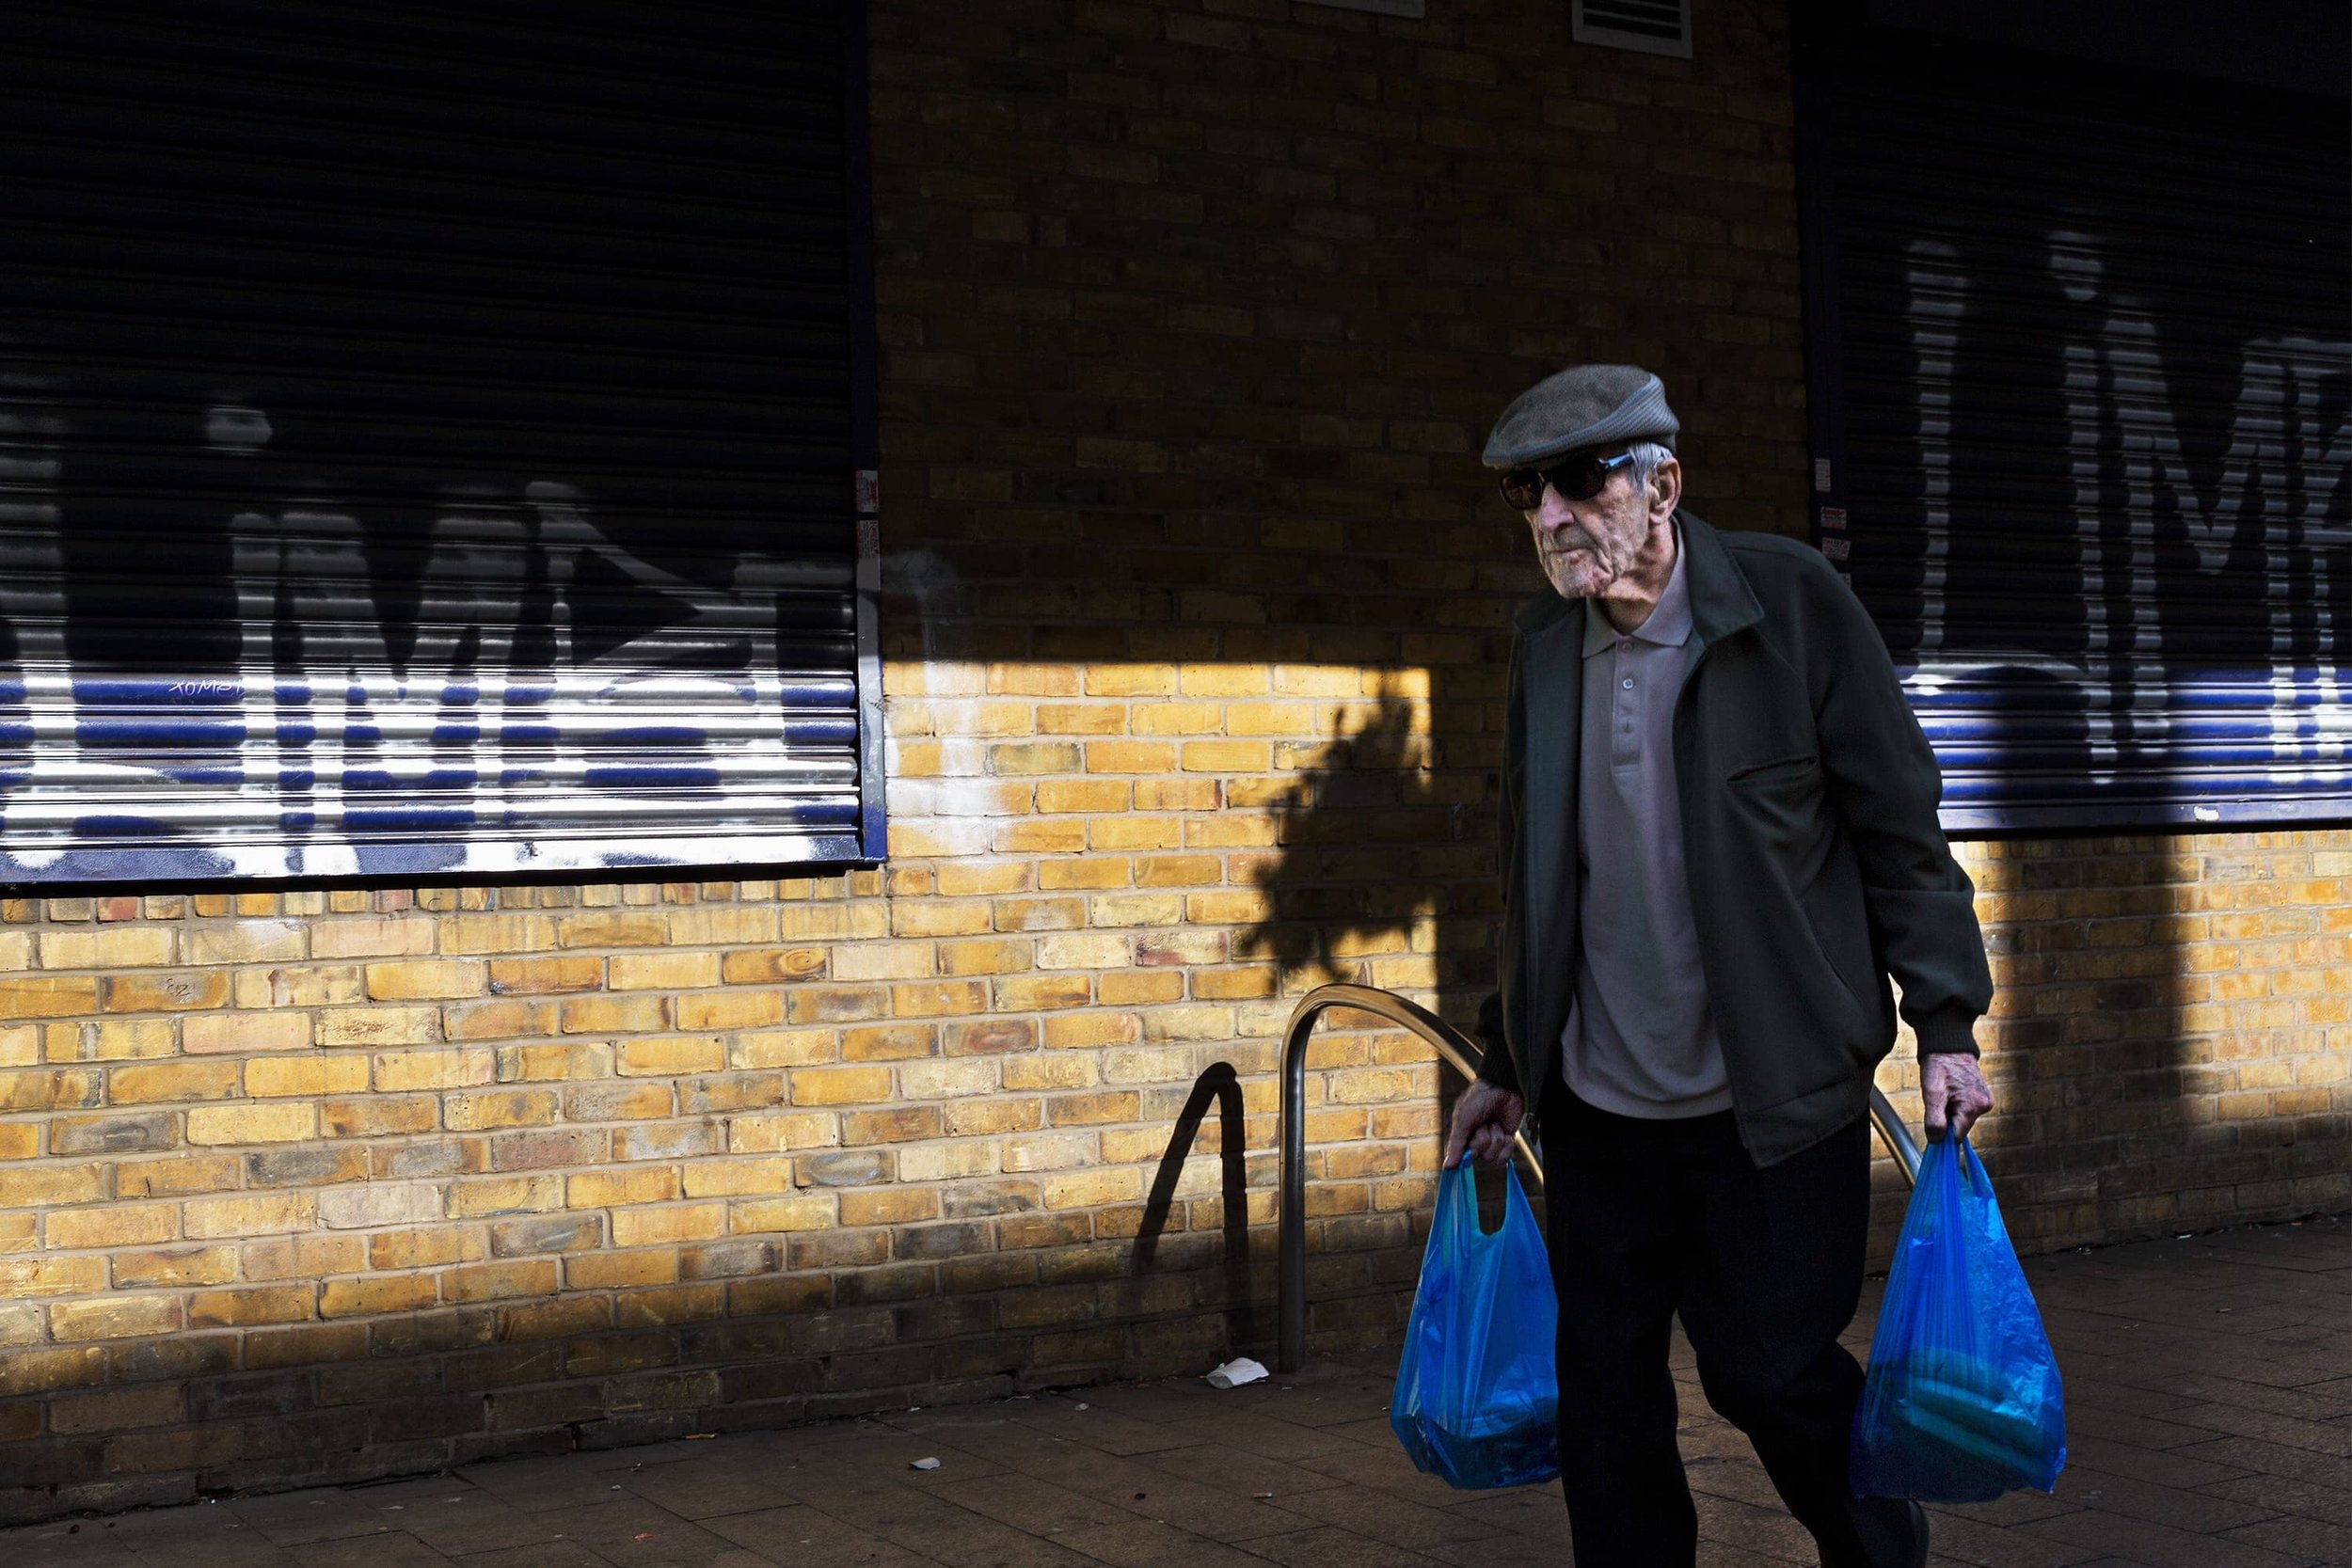 street-documentary-photography-fabio-burrelli-24.jpg